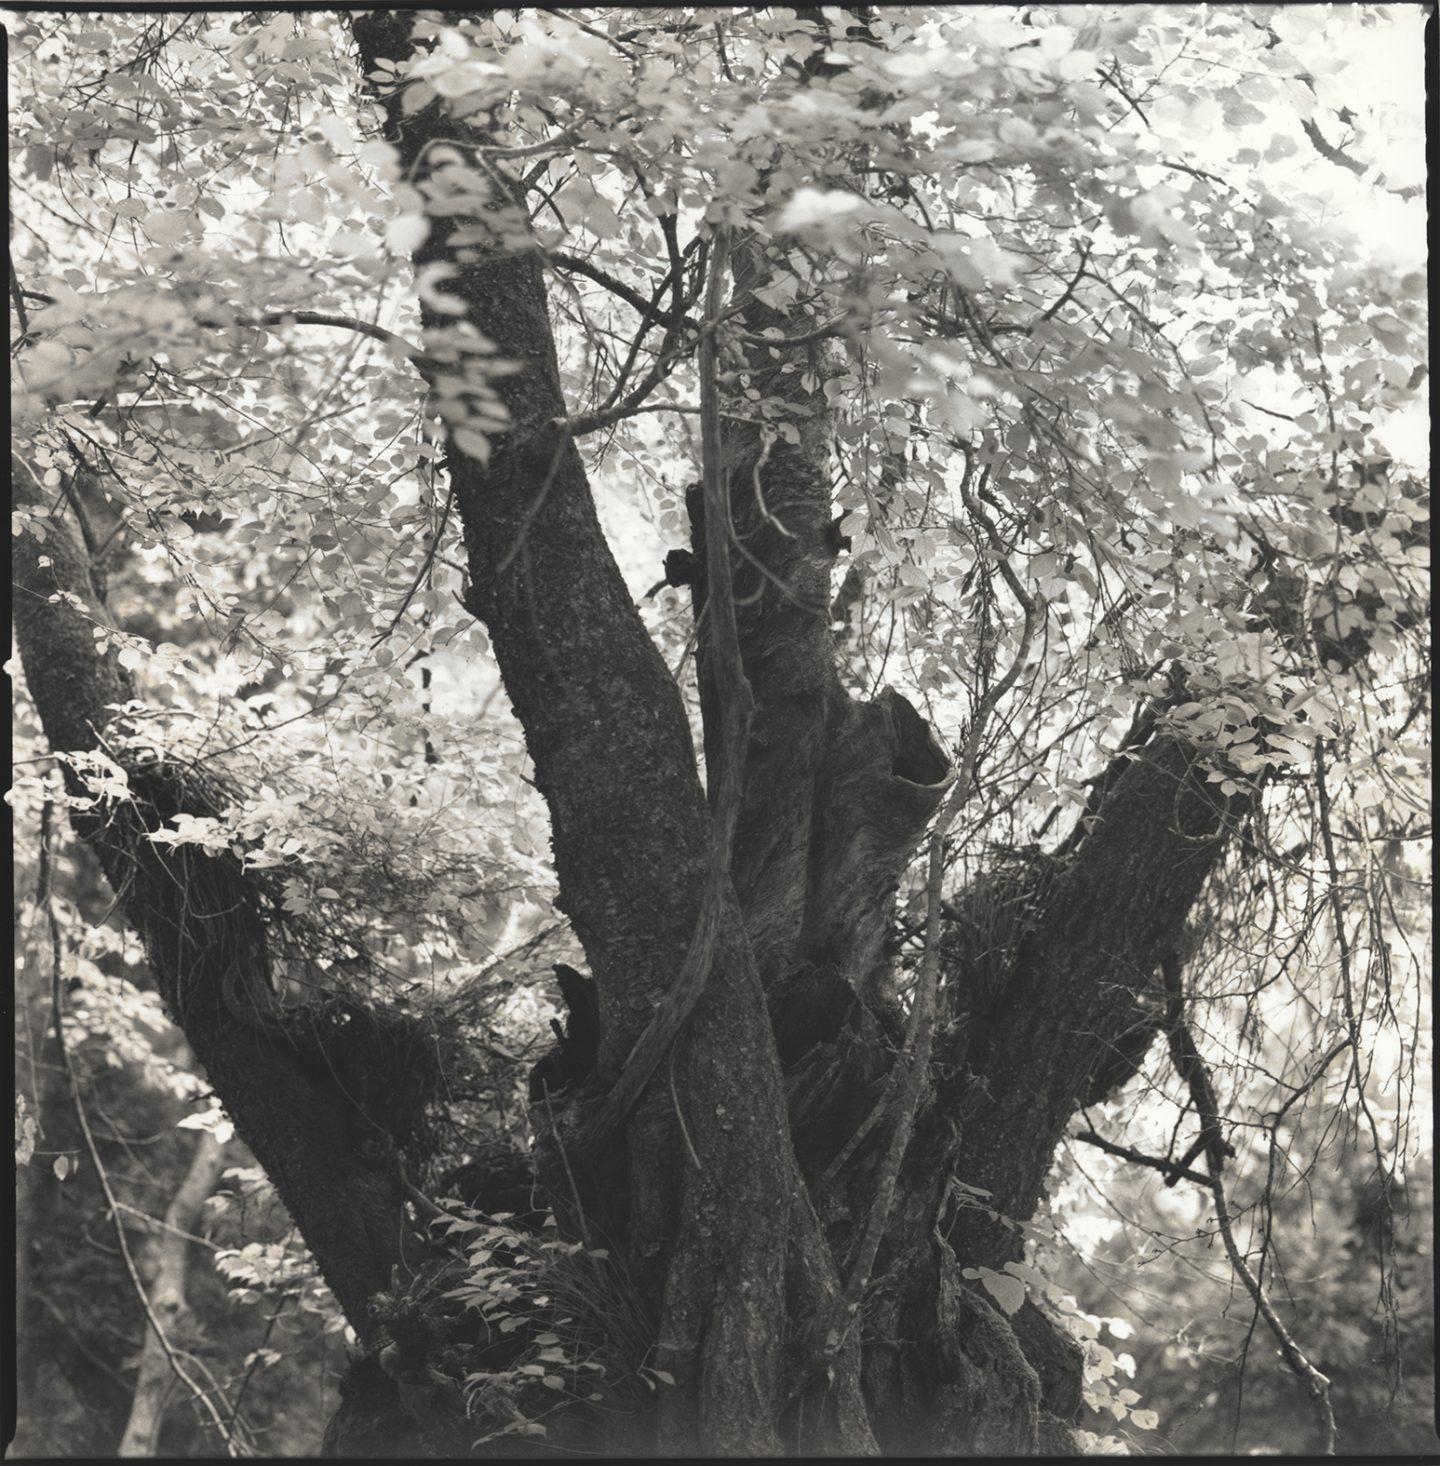 IGNANT-Photography-Hiroshi-Watanabe-Kwaidan-03